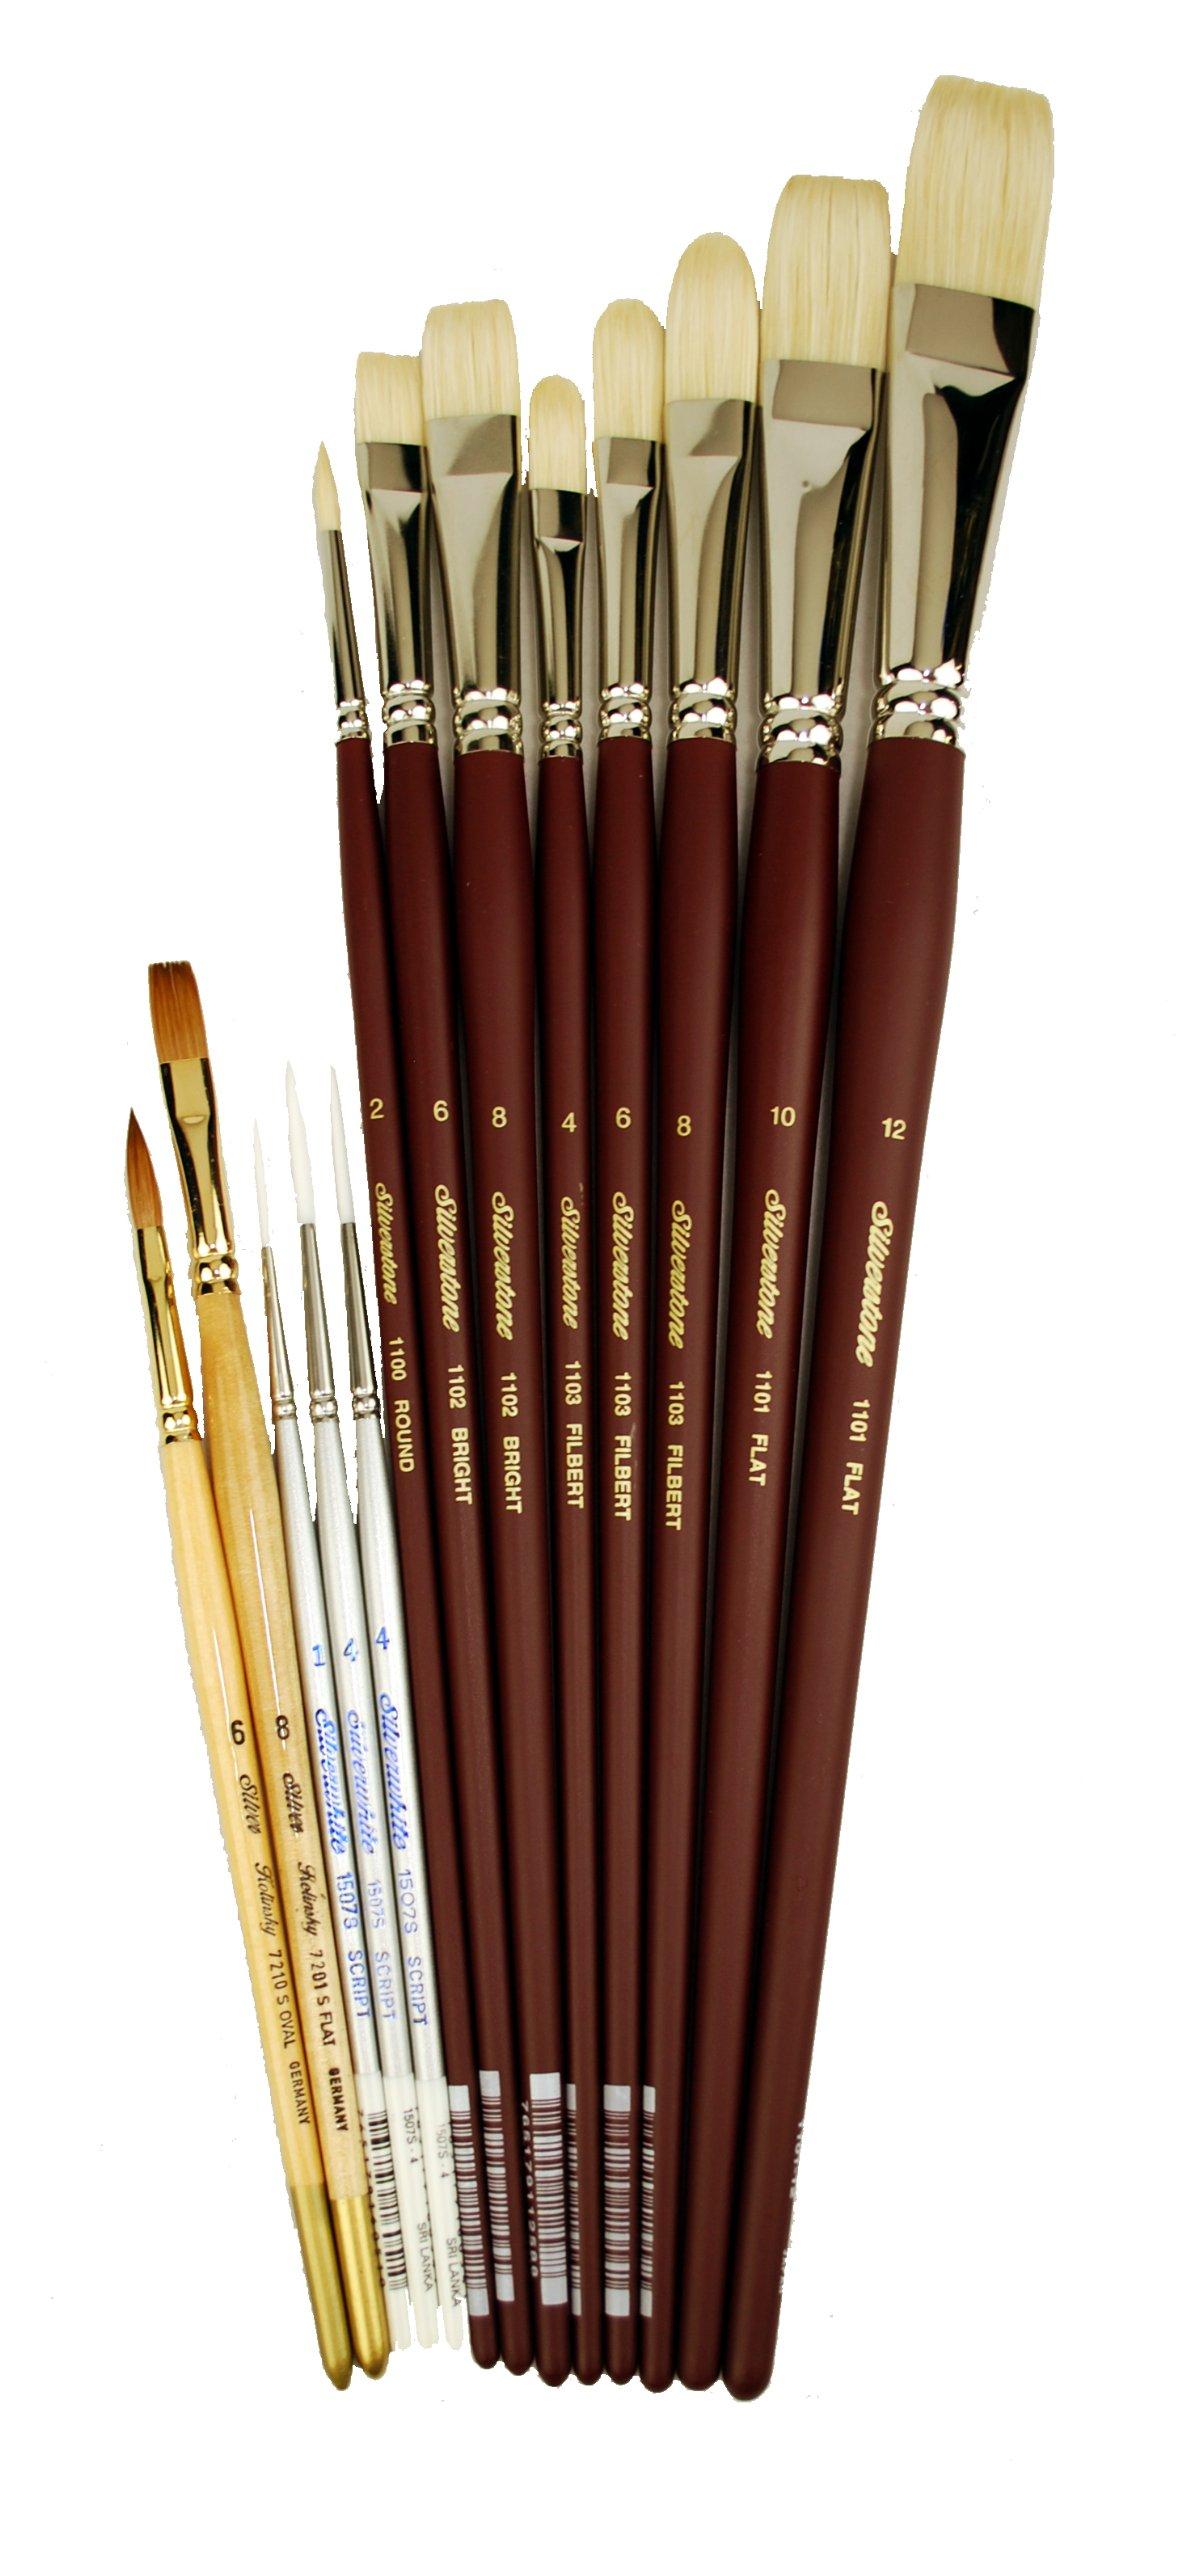 Silver Brush BT-613 Burton Silverman Figure and Drawing Basic Brush Set, 13 Per Pack